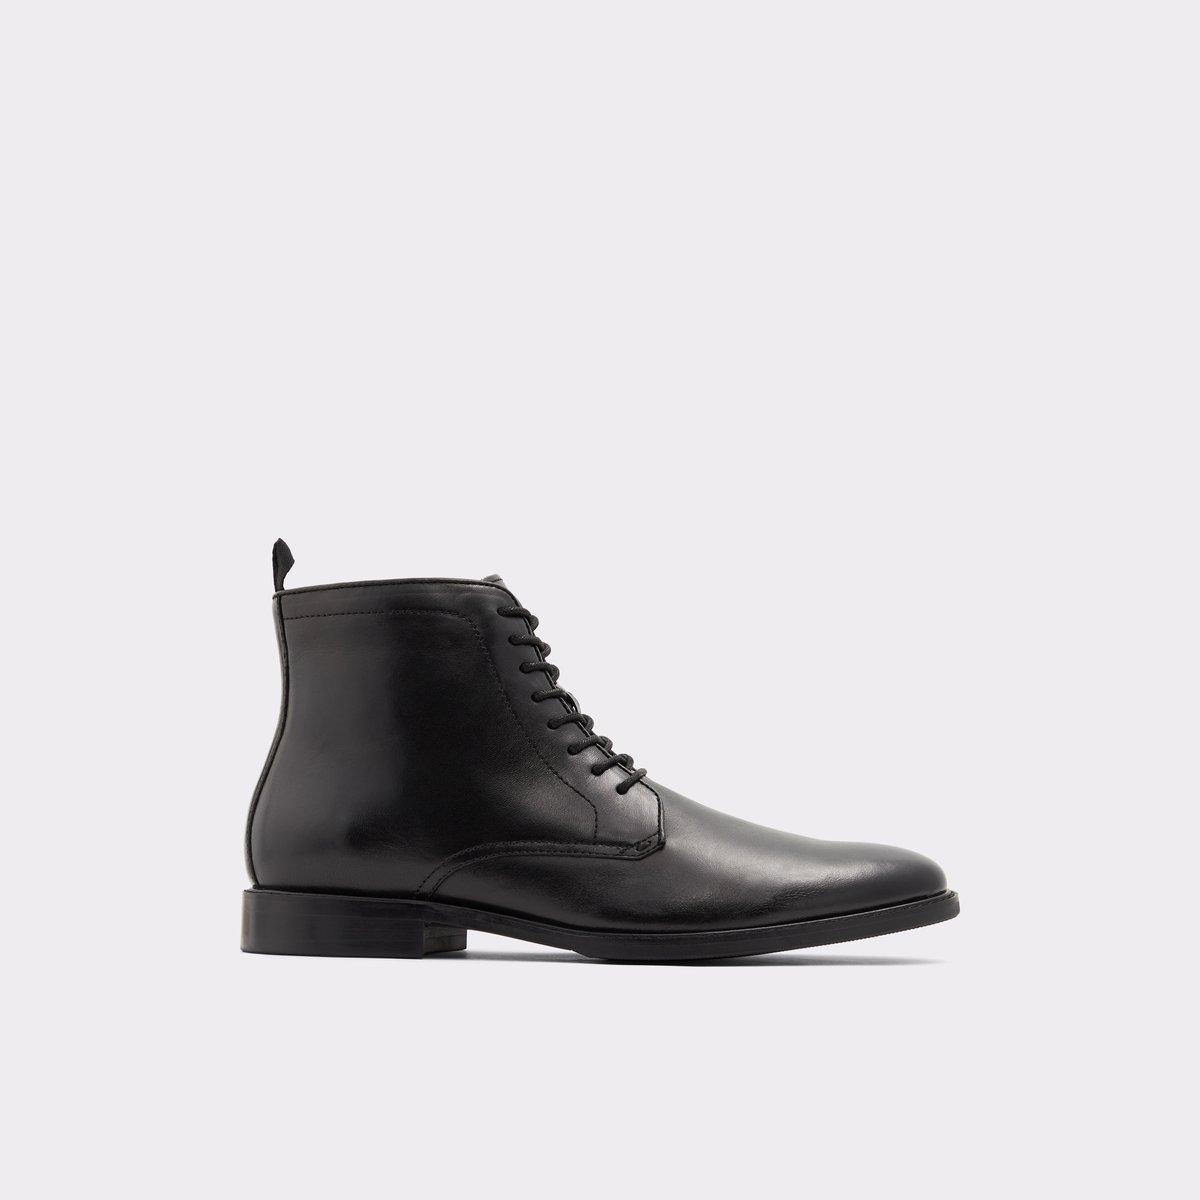 Mirenarwen Black Men's Dress boots